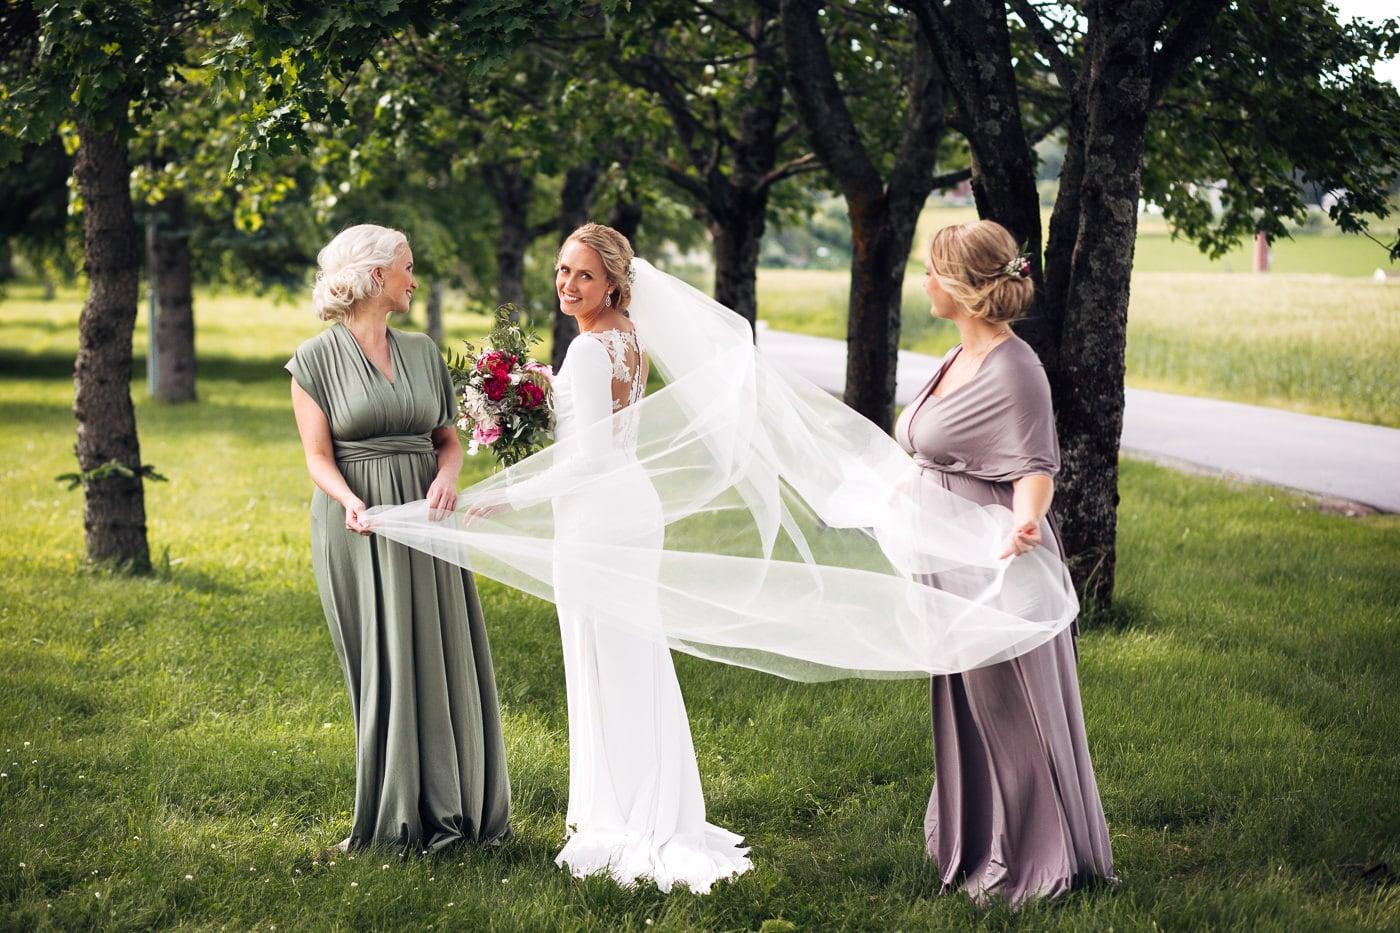 Karoline & Andreas - bryllup i Østfold med magiske detaljer Bryllup Fredrikstad Fotograf 48